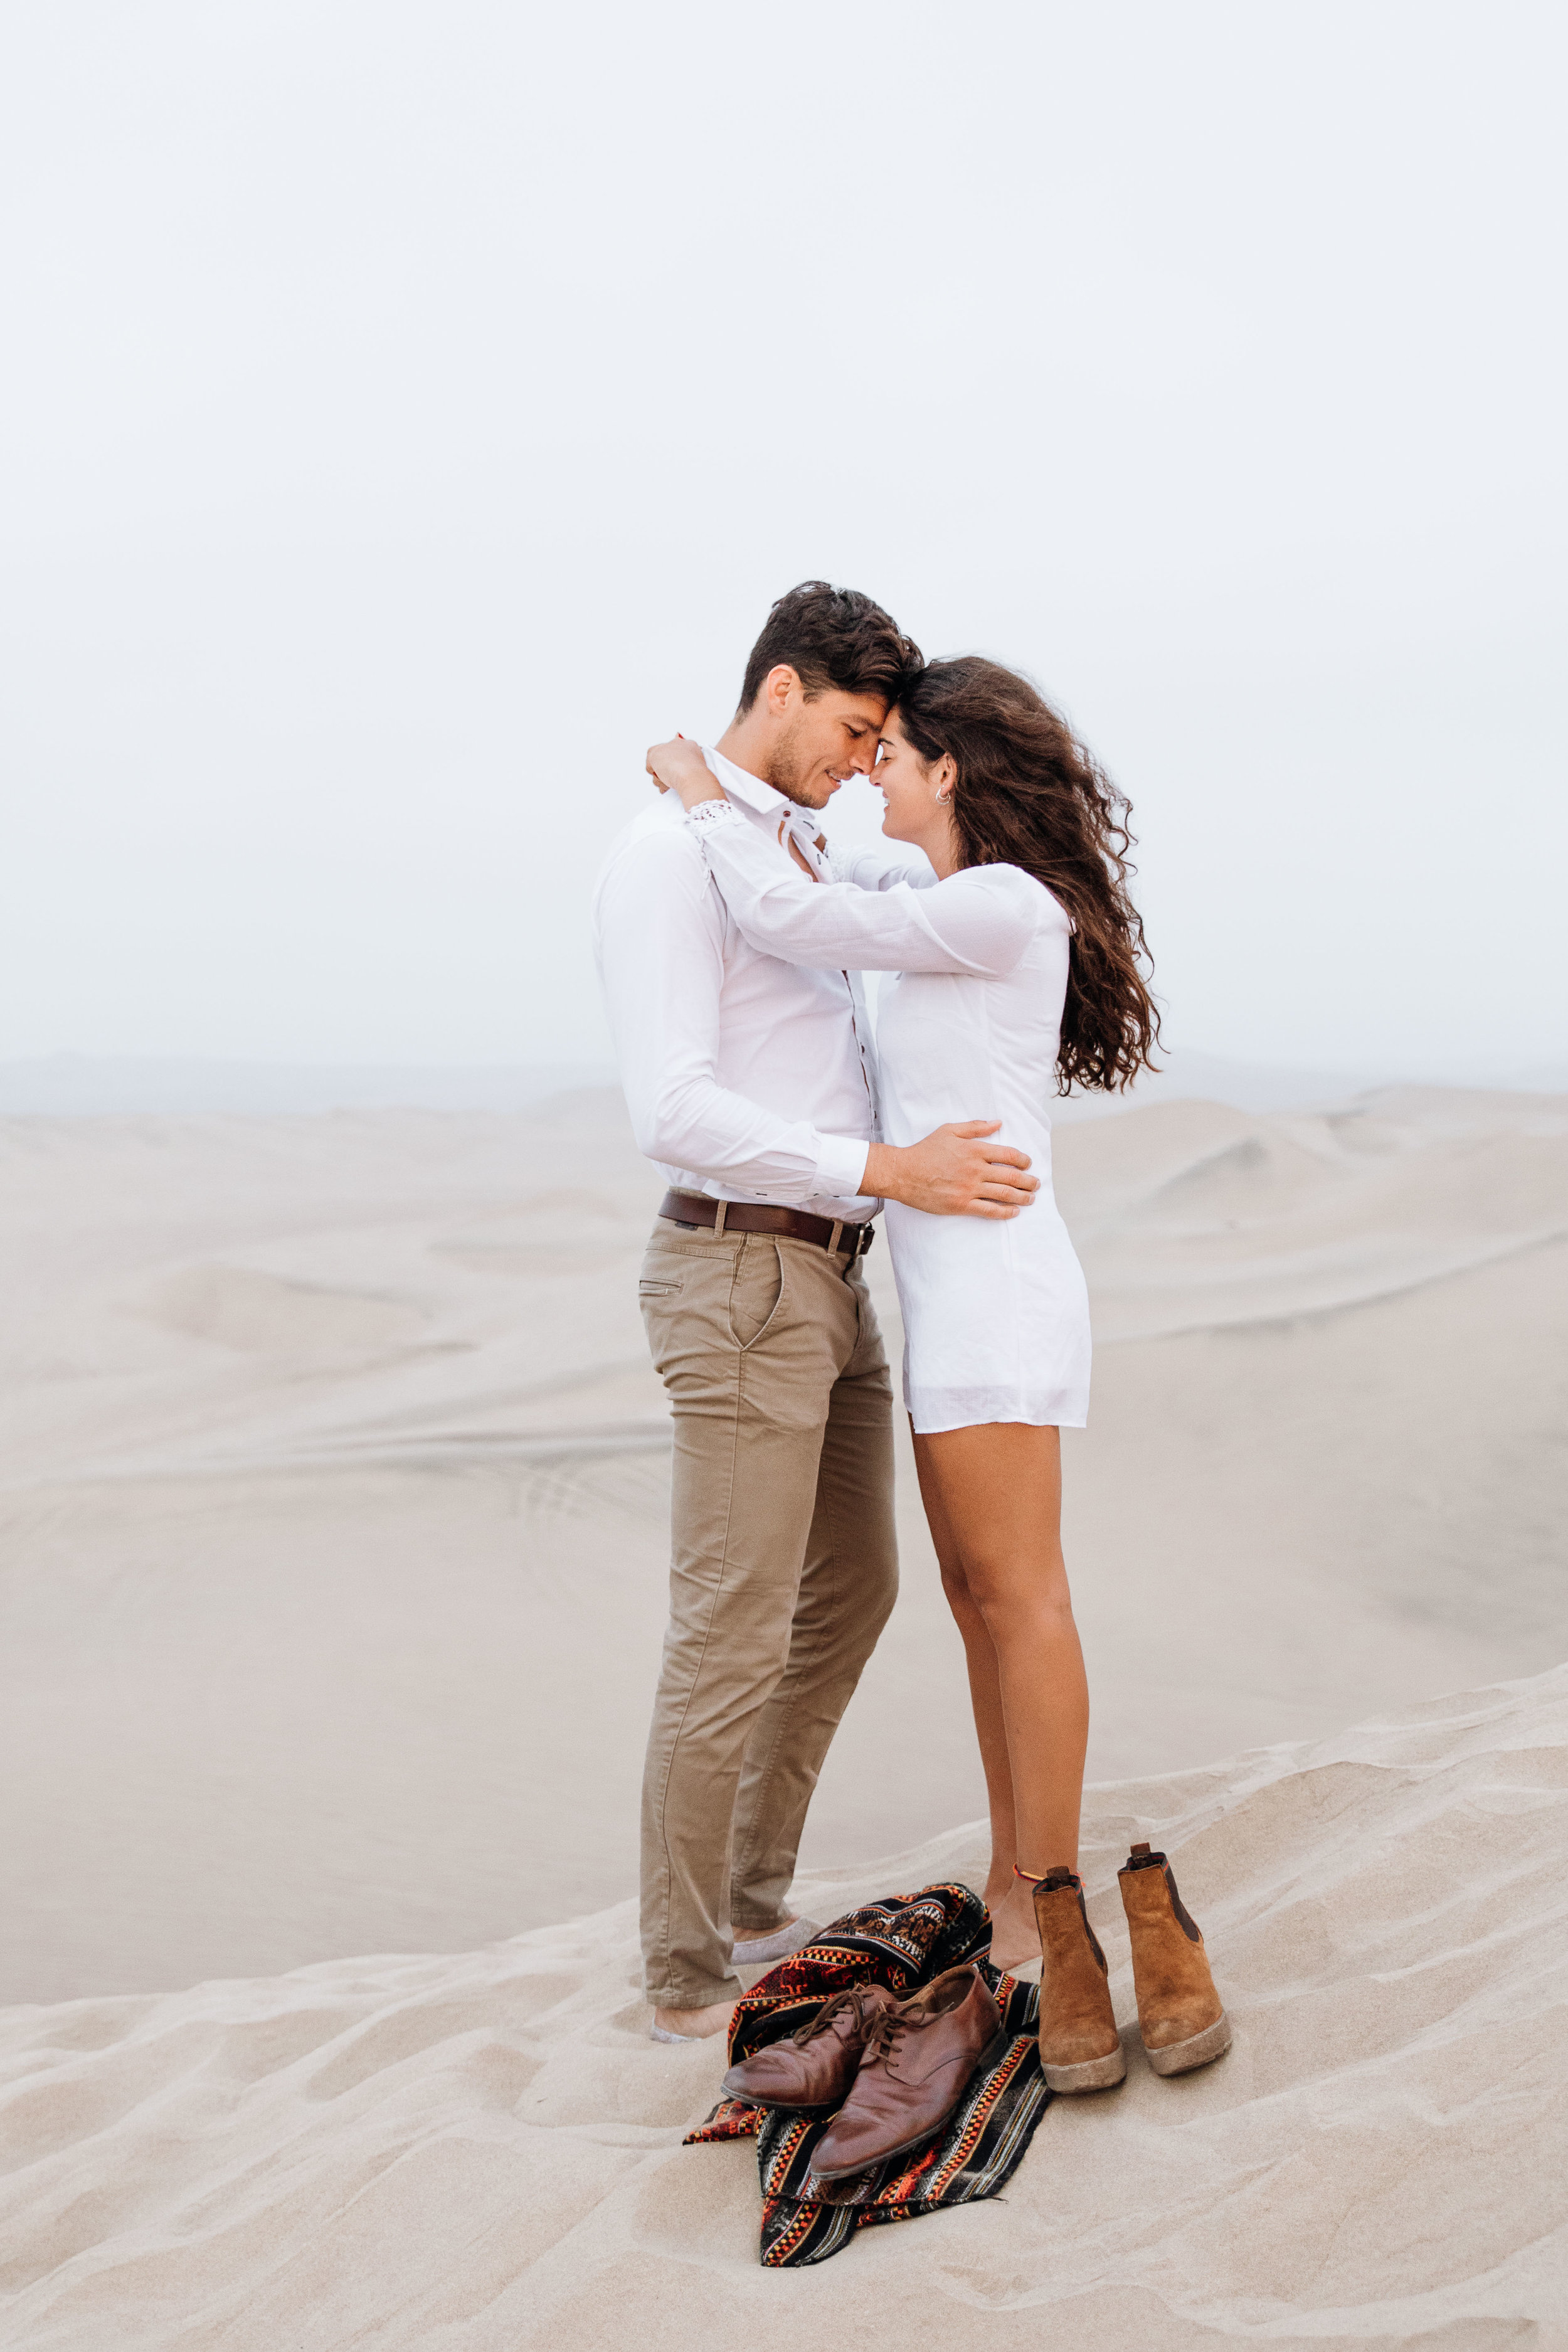 huacachina-peru-honeymoon-elopement-destination-wedding-photography-michael-cozzens-4.jpg